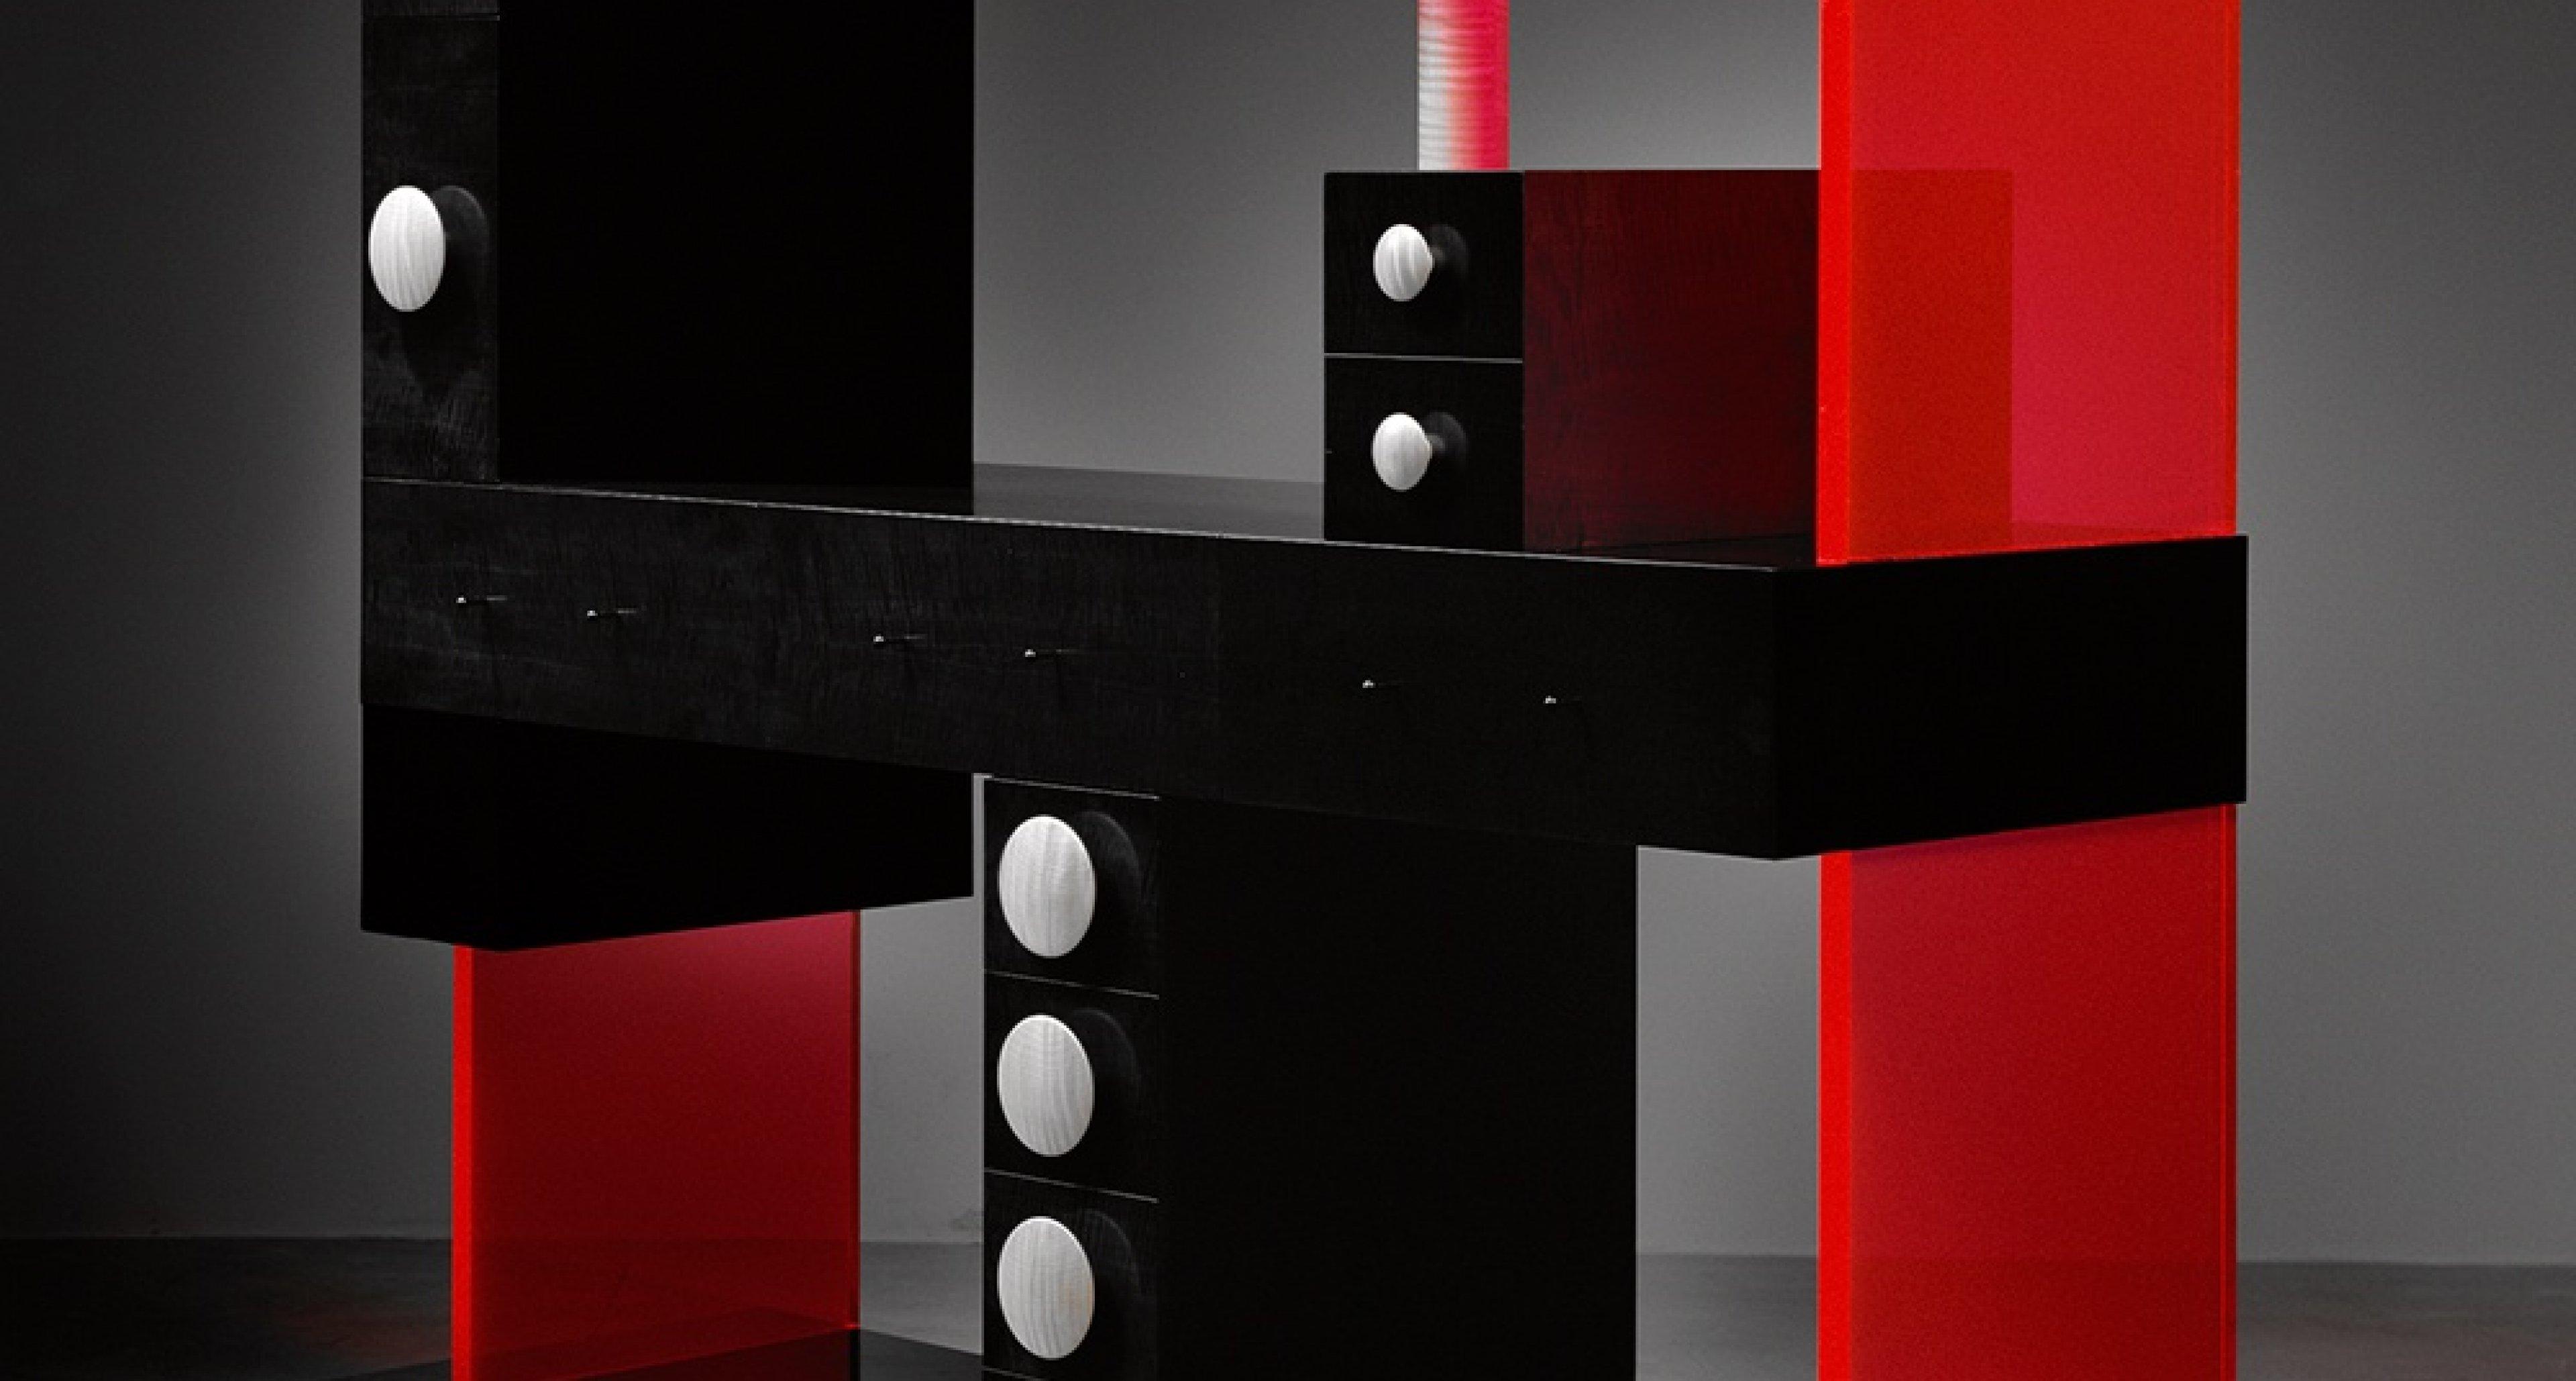 Ettore Sottsass (Italian, 1917-2007) Cabinet No. 56 2003 Wood, ebonized pearwood veneer, acrylic 80 1/8 × 82 7/8 × 23 5/8 in. (203.5 × 210.5 × 60 cm) Courtesy of The Gallery Mourmans © Studio Ettore Sottsass Srl